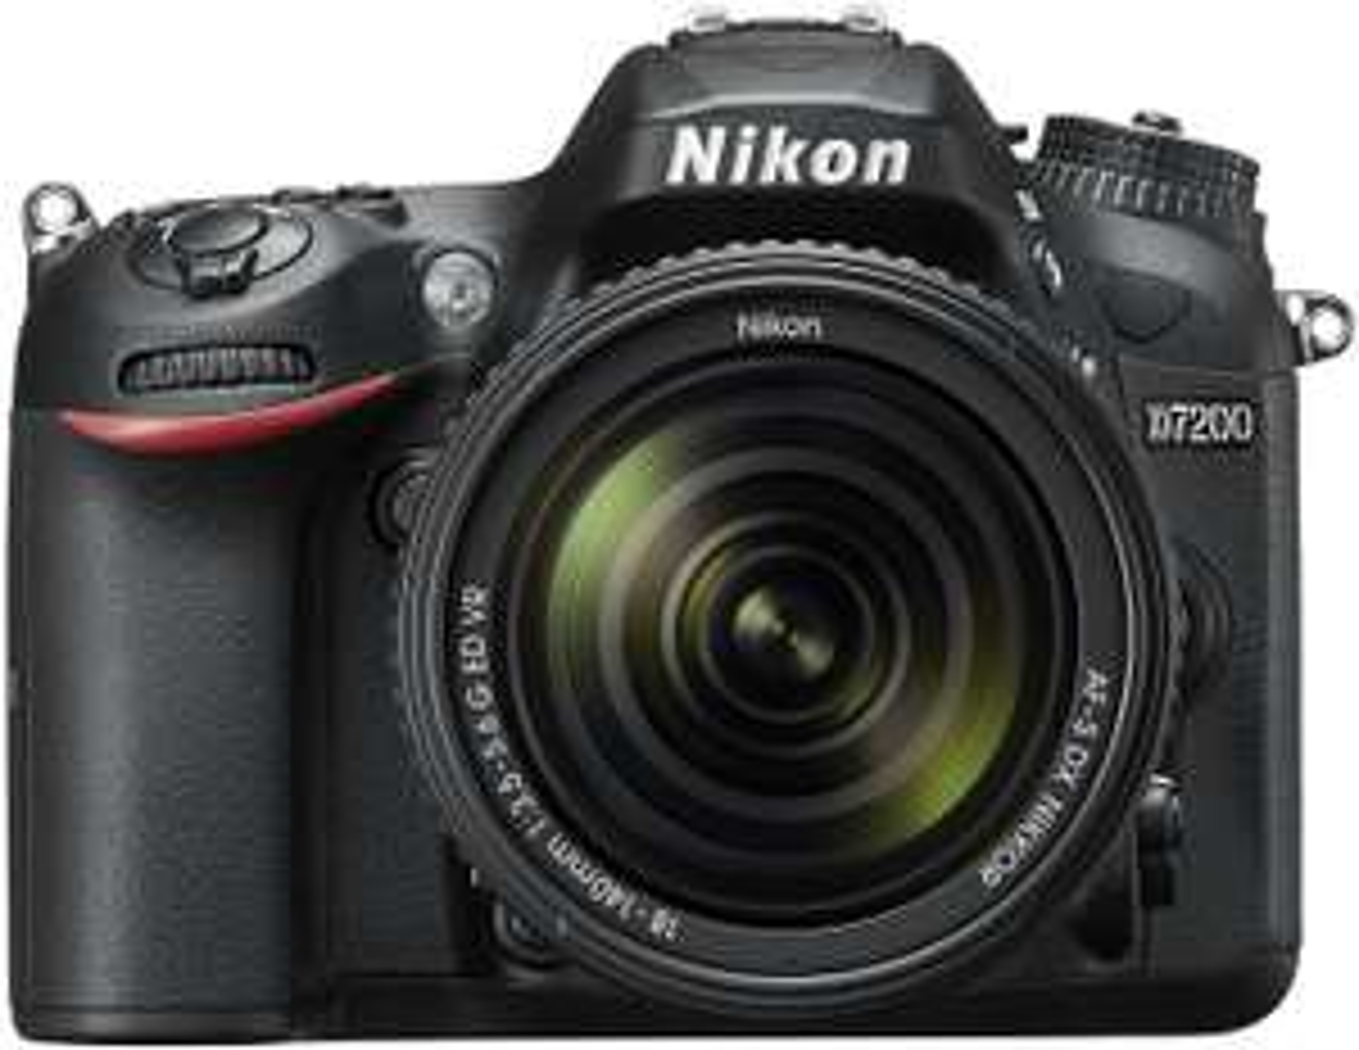 Nikon D7200 Spiegelreflexkamera inkl. 18-140F3,5-5,6 ED VR Objektiv